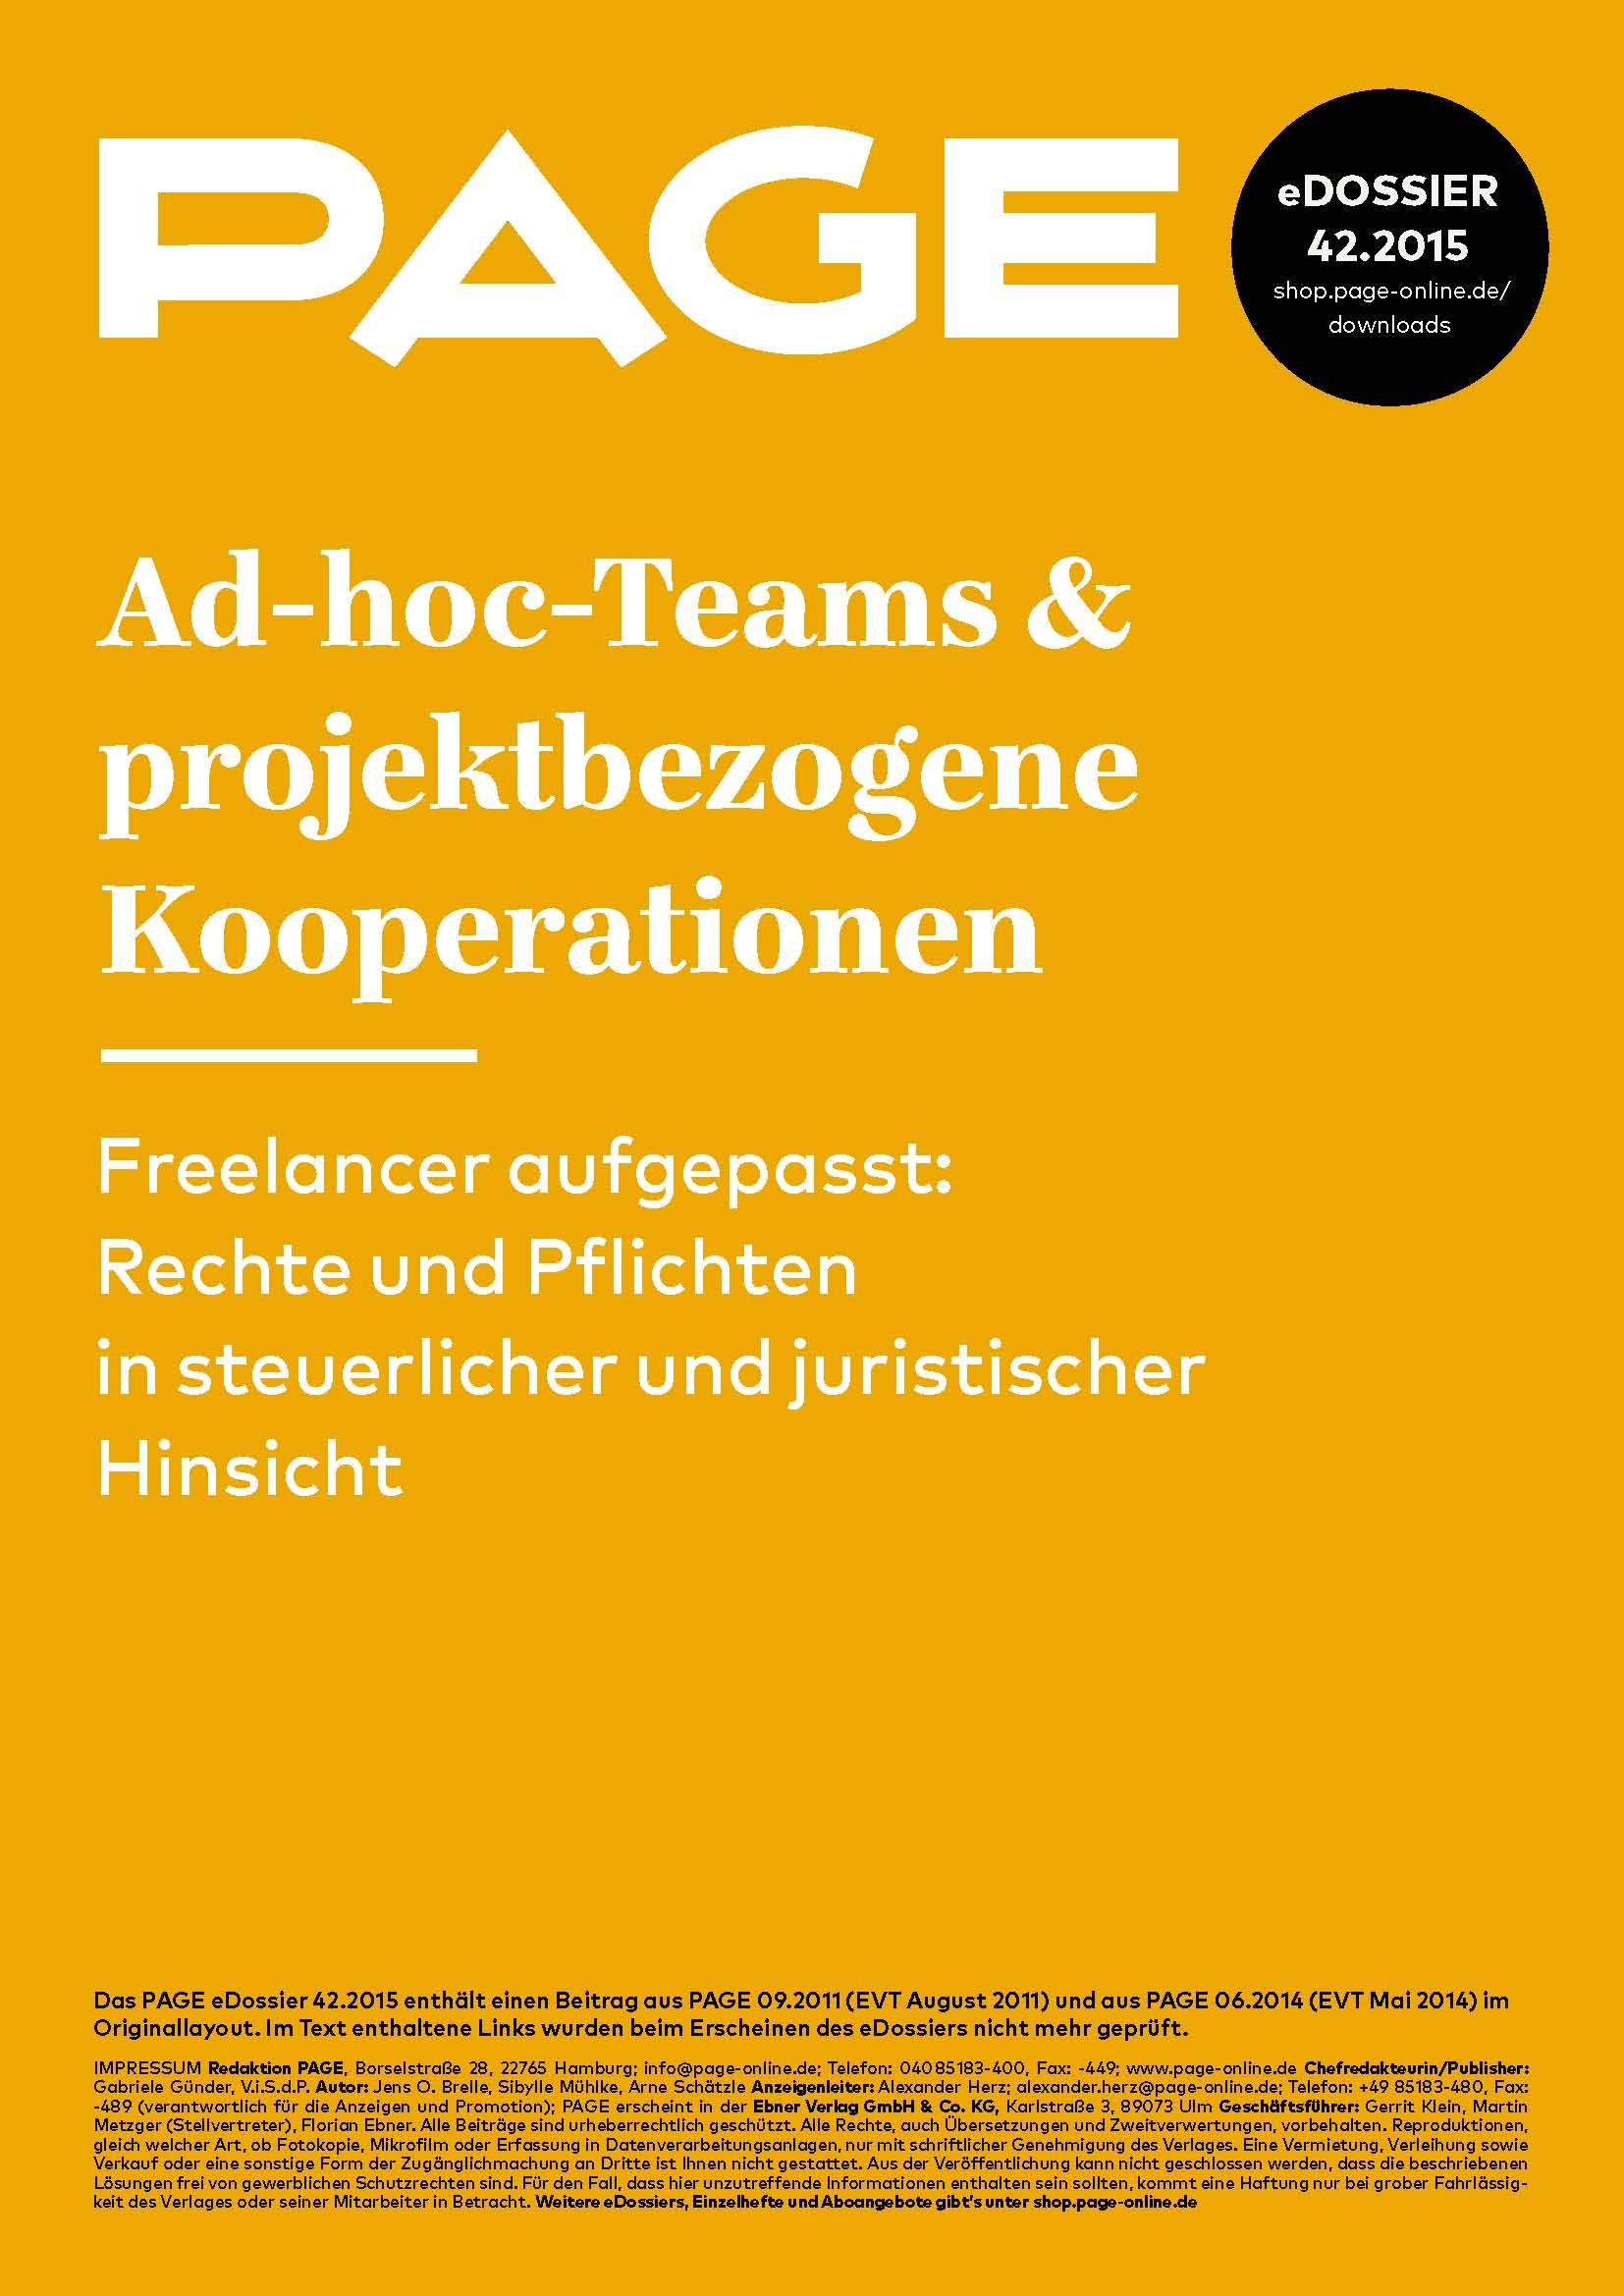 Produkt: eDossier: »Ad-hoc-Teams & projektbezogene Kooperationen«